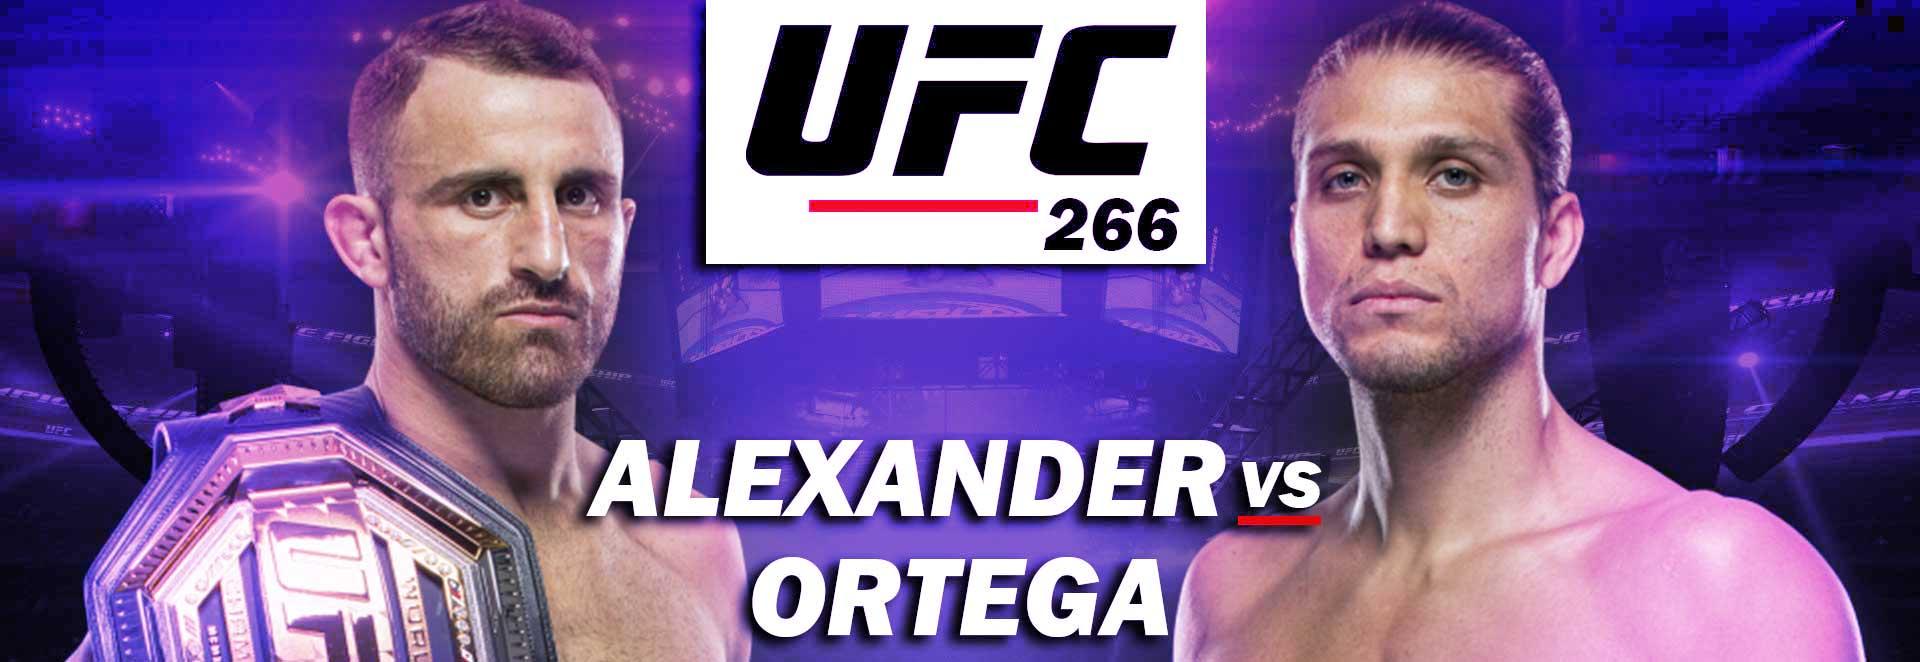 UFC-266-free-kodi-live-stream-ortega-diaz-lawler